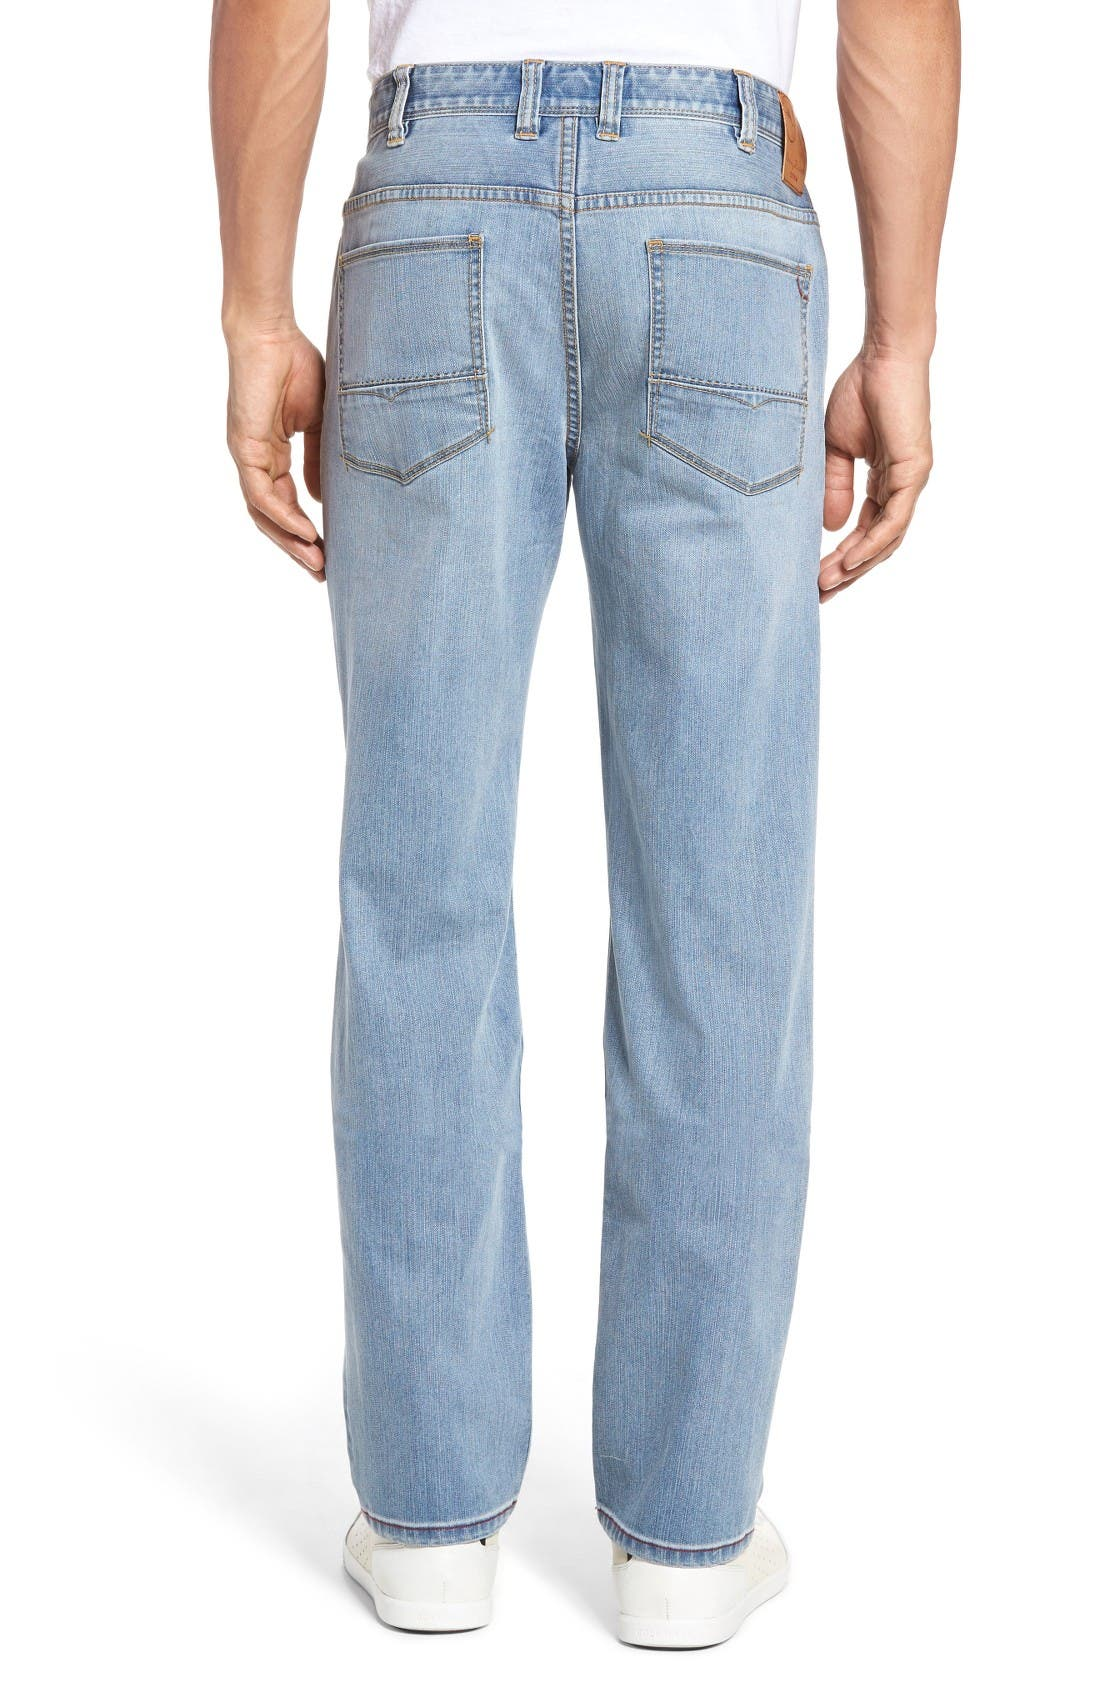 Sorrento Straight Leg Jeans,                             Alternate thumbnail 2, color,                             Light Wash